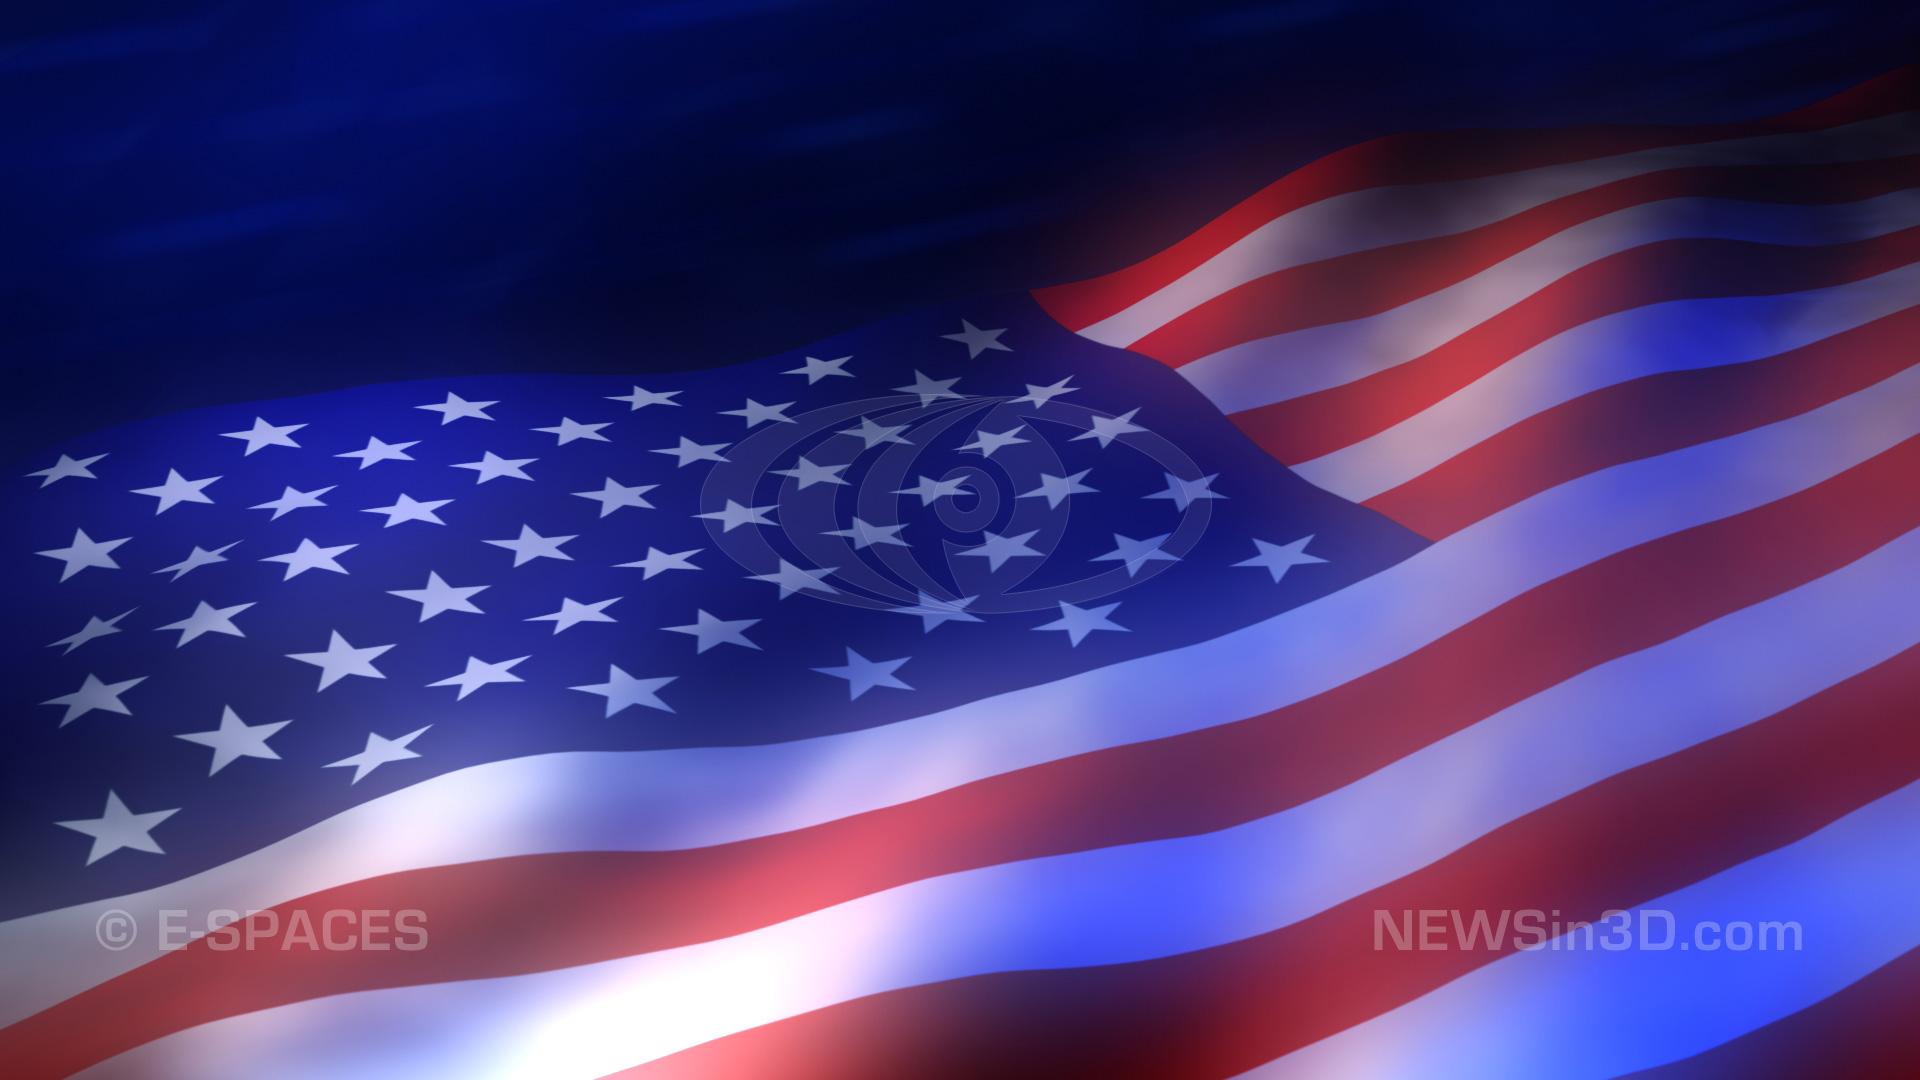 American Flag Background wallpaper   126848 1920x1080